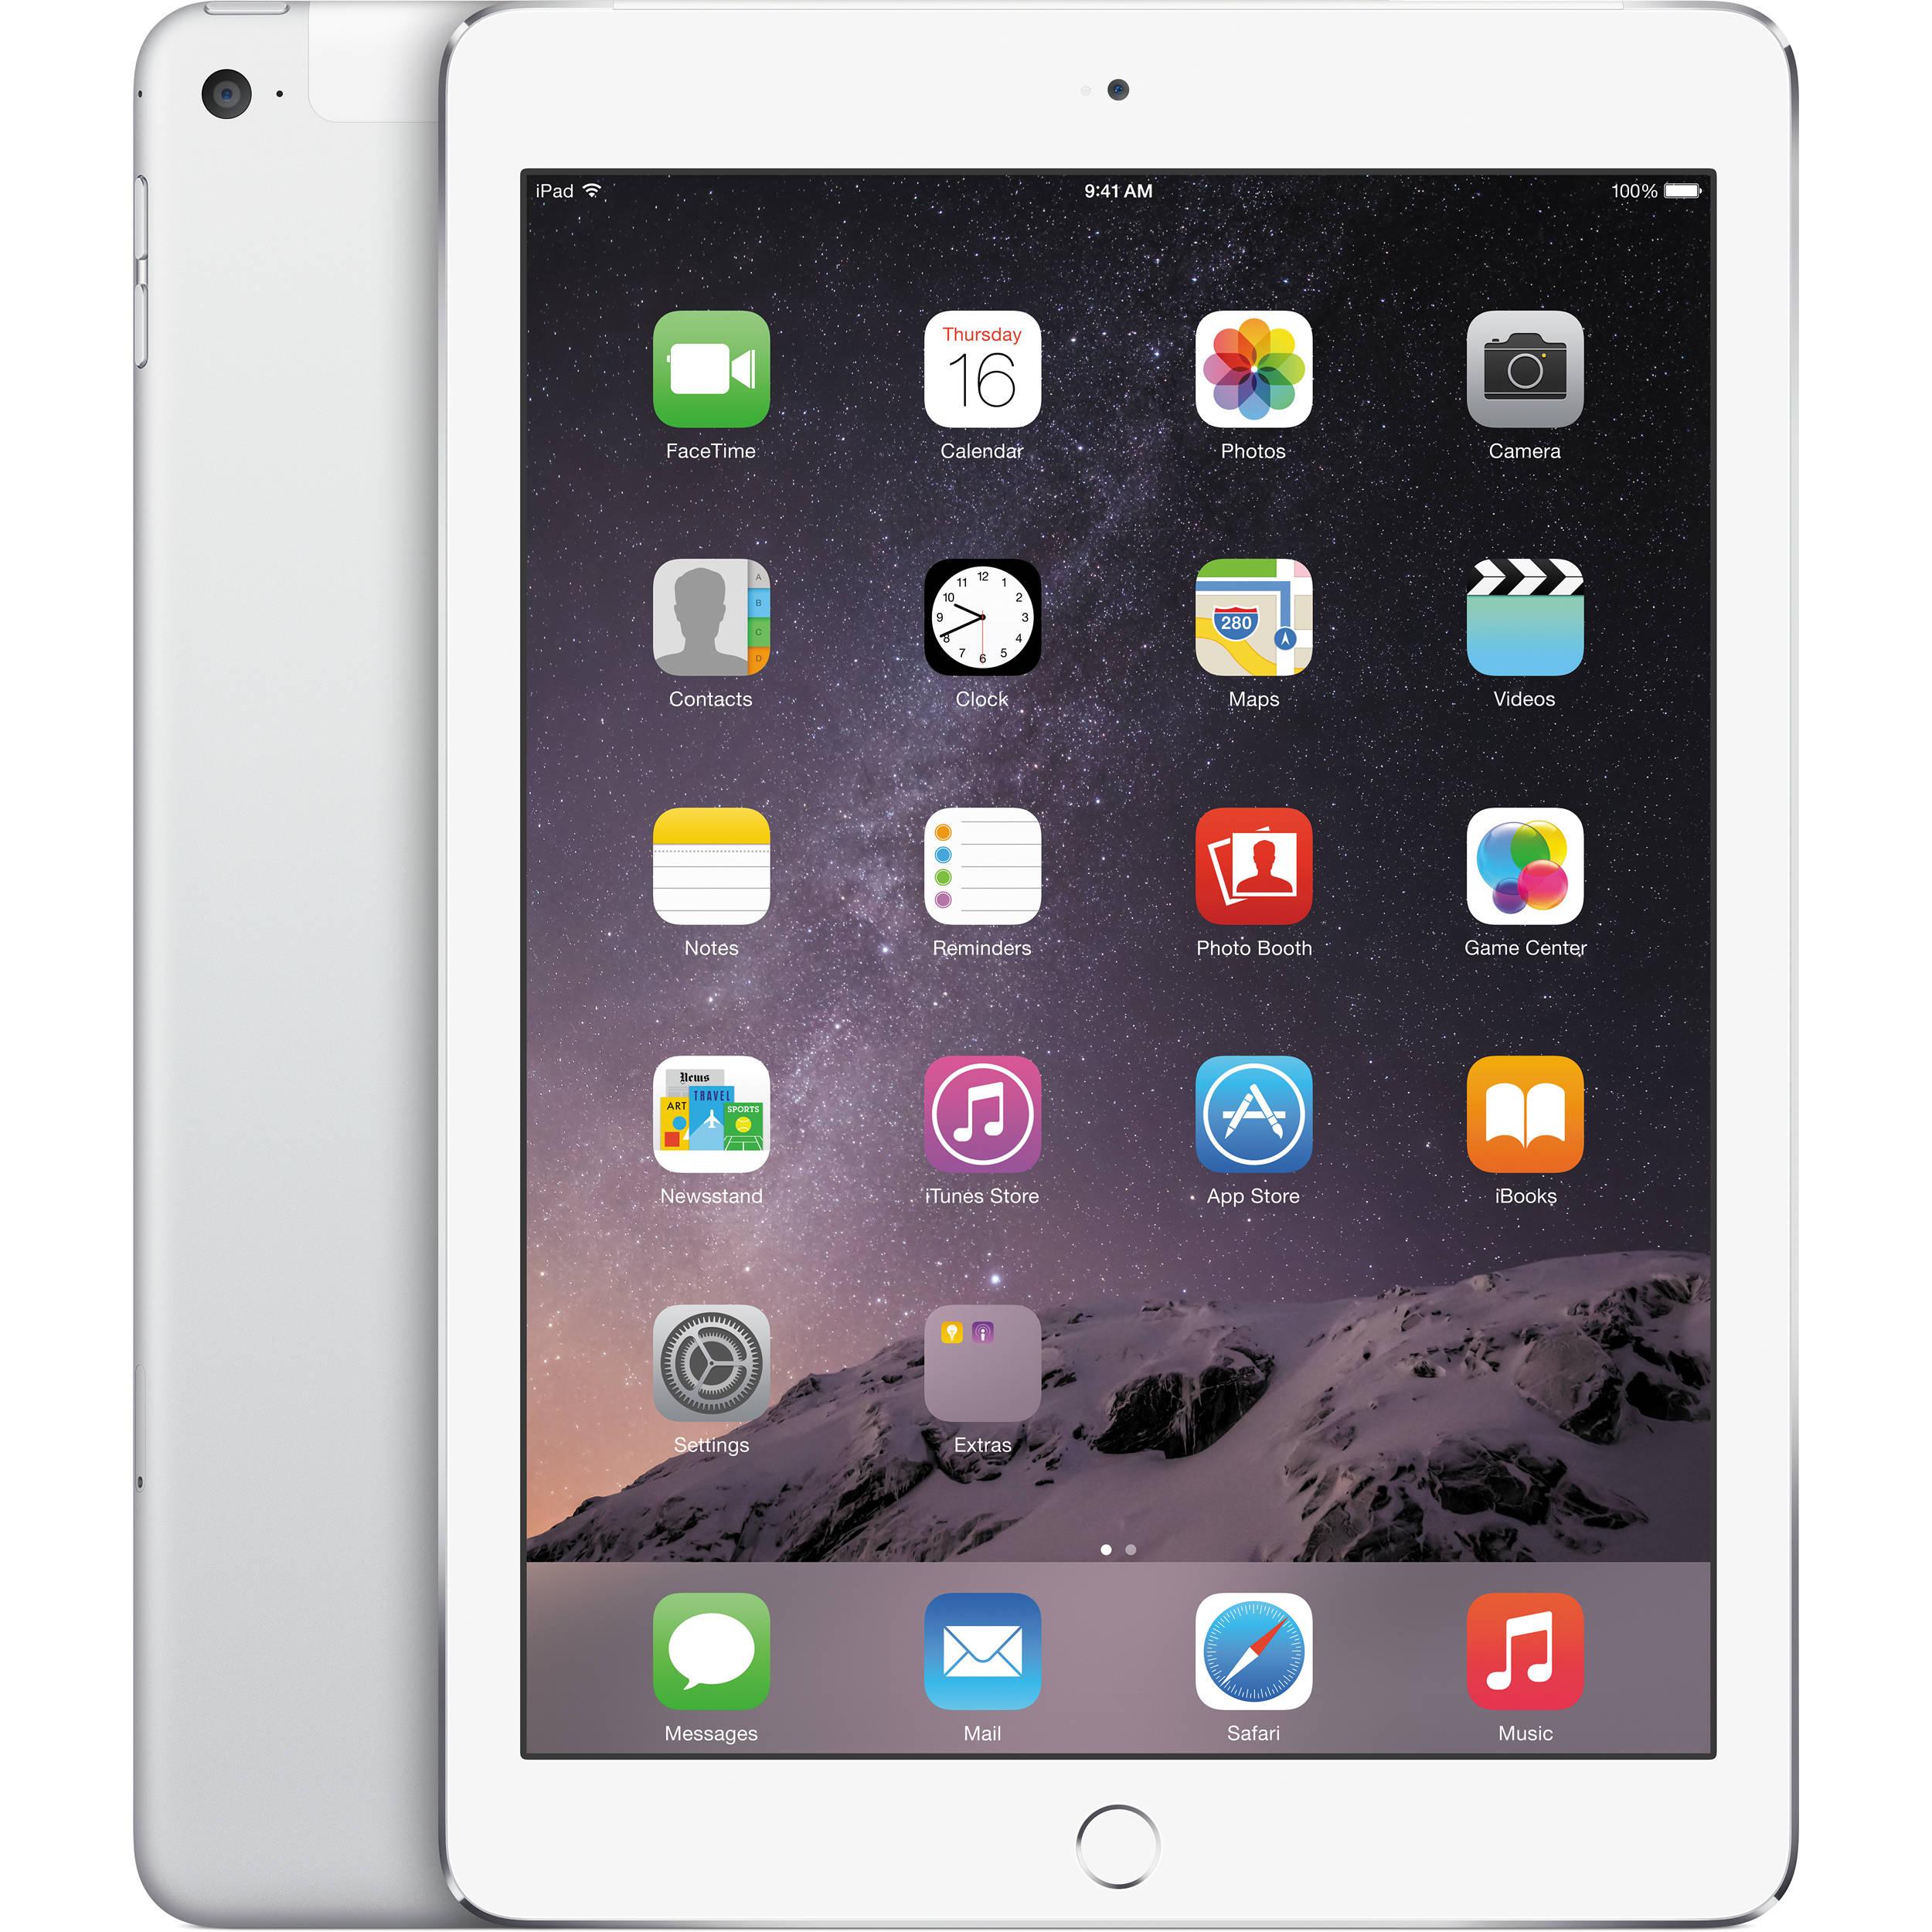 apple 64gb ipad air 2 wi fi 4g lte silver mh2n2ll a b h rh bhphotovideo com Apple A1430 iPad Charger New Apple iPad